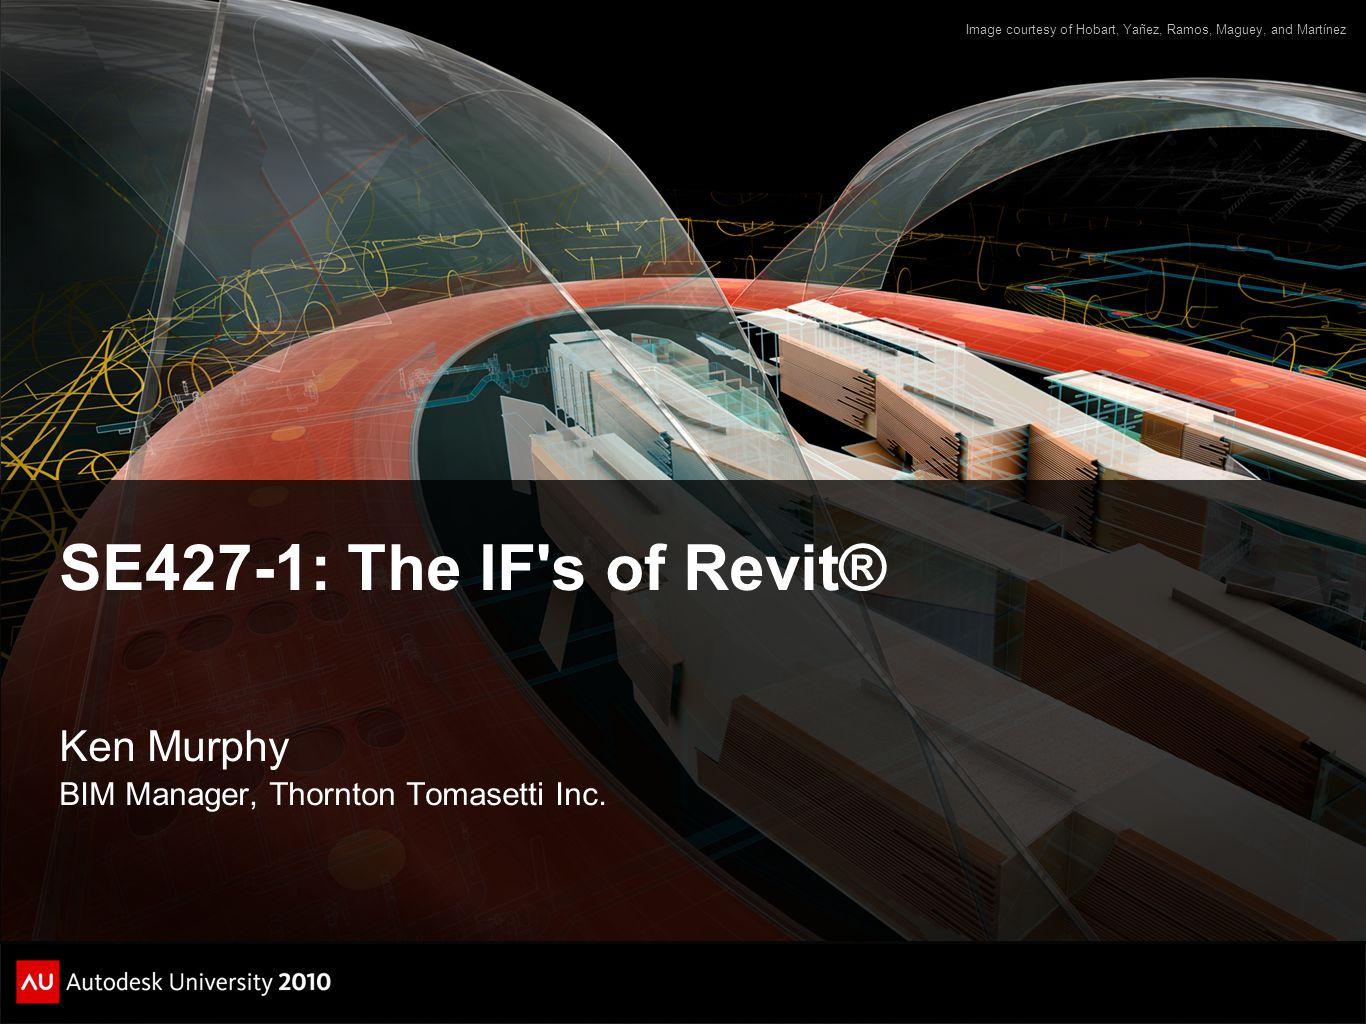 SE427-1: The IF's of Revit® Ken Murphy BIM Manager, Thornton Tomasetti Inc. Image courtesy of Hobart, Yañez, Ramos, Maguey, and Martínez